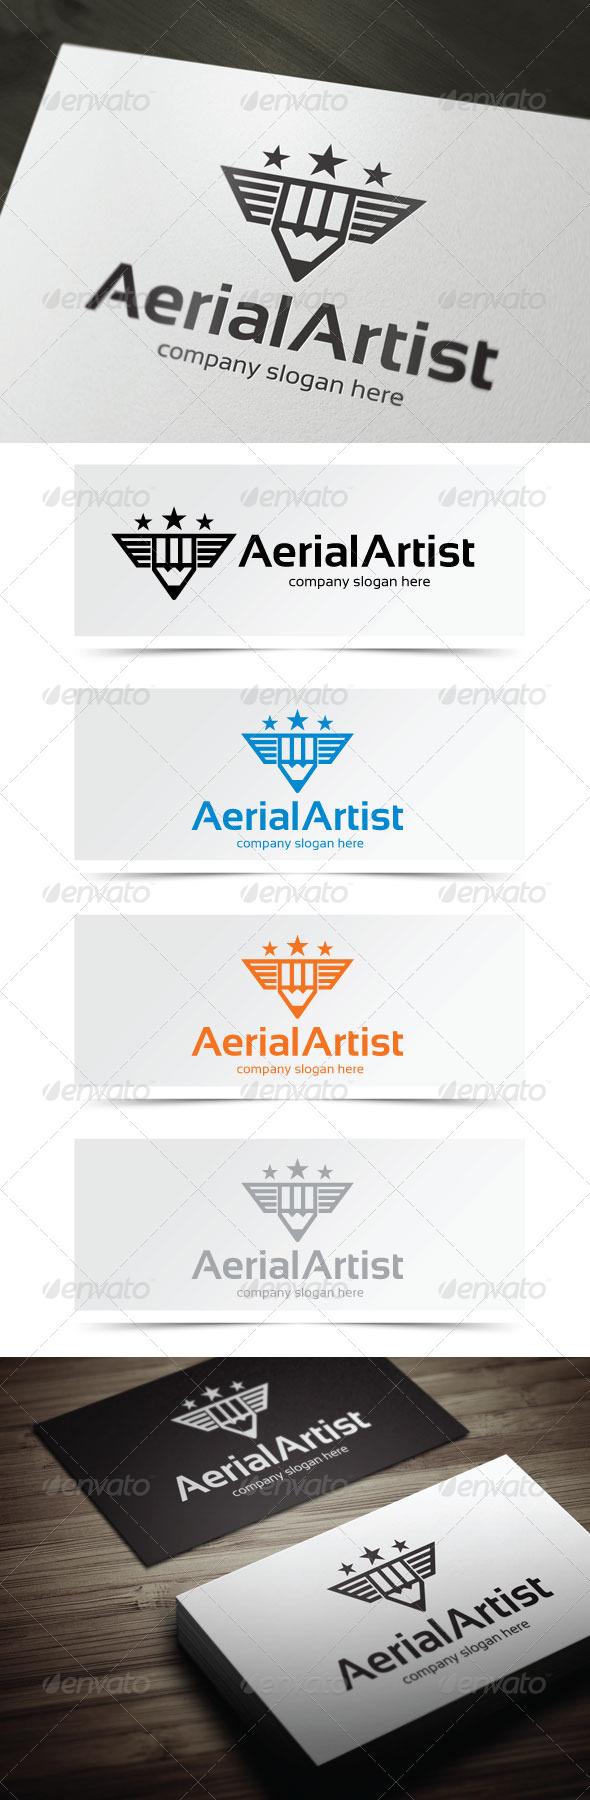 GraphicRiver Aerial Artist 5237003